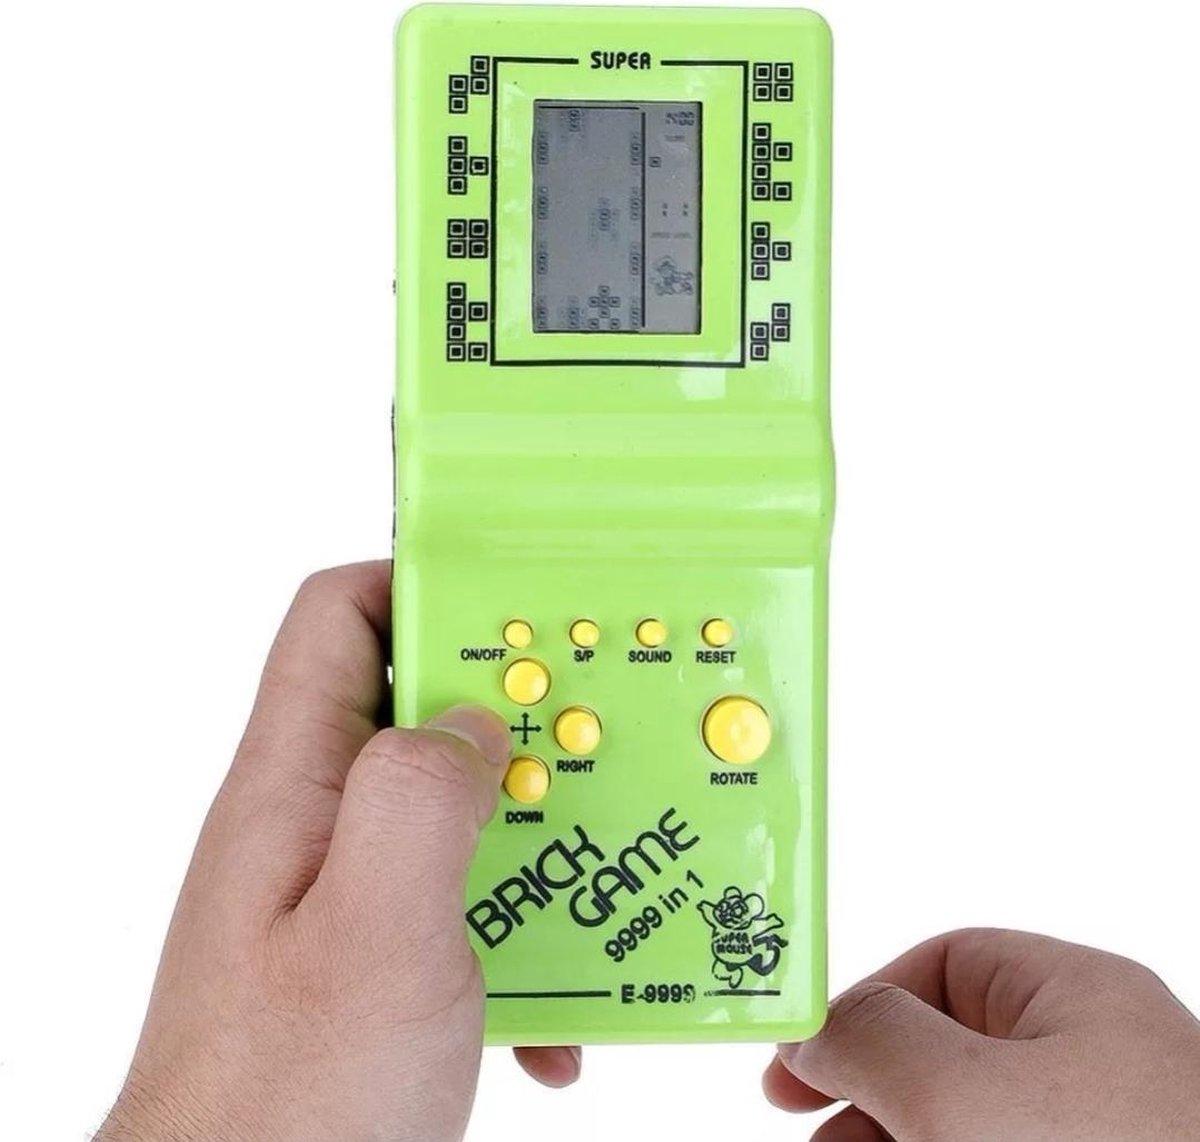 BBEC Toys Klassieke Tetris Spel Brick Game Handheld LCD Electronic Game Retro Groen